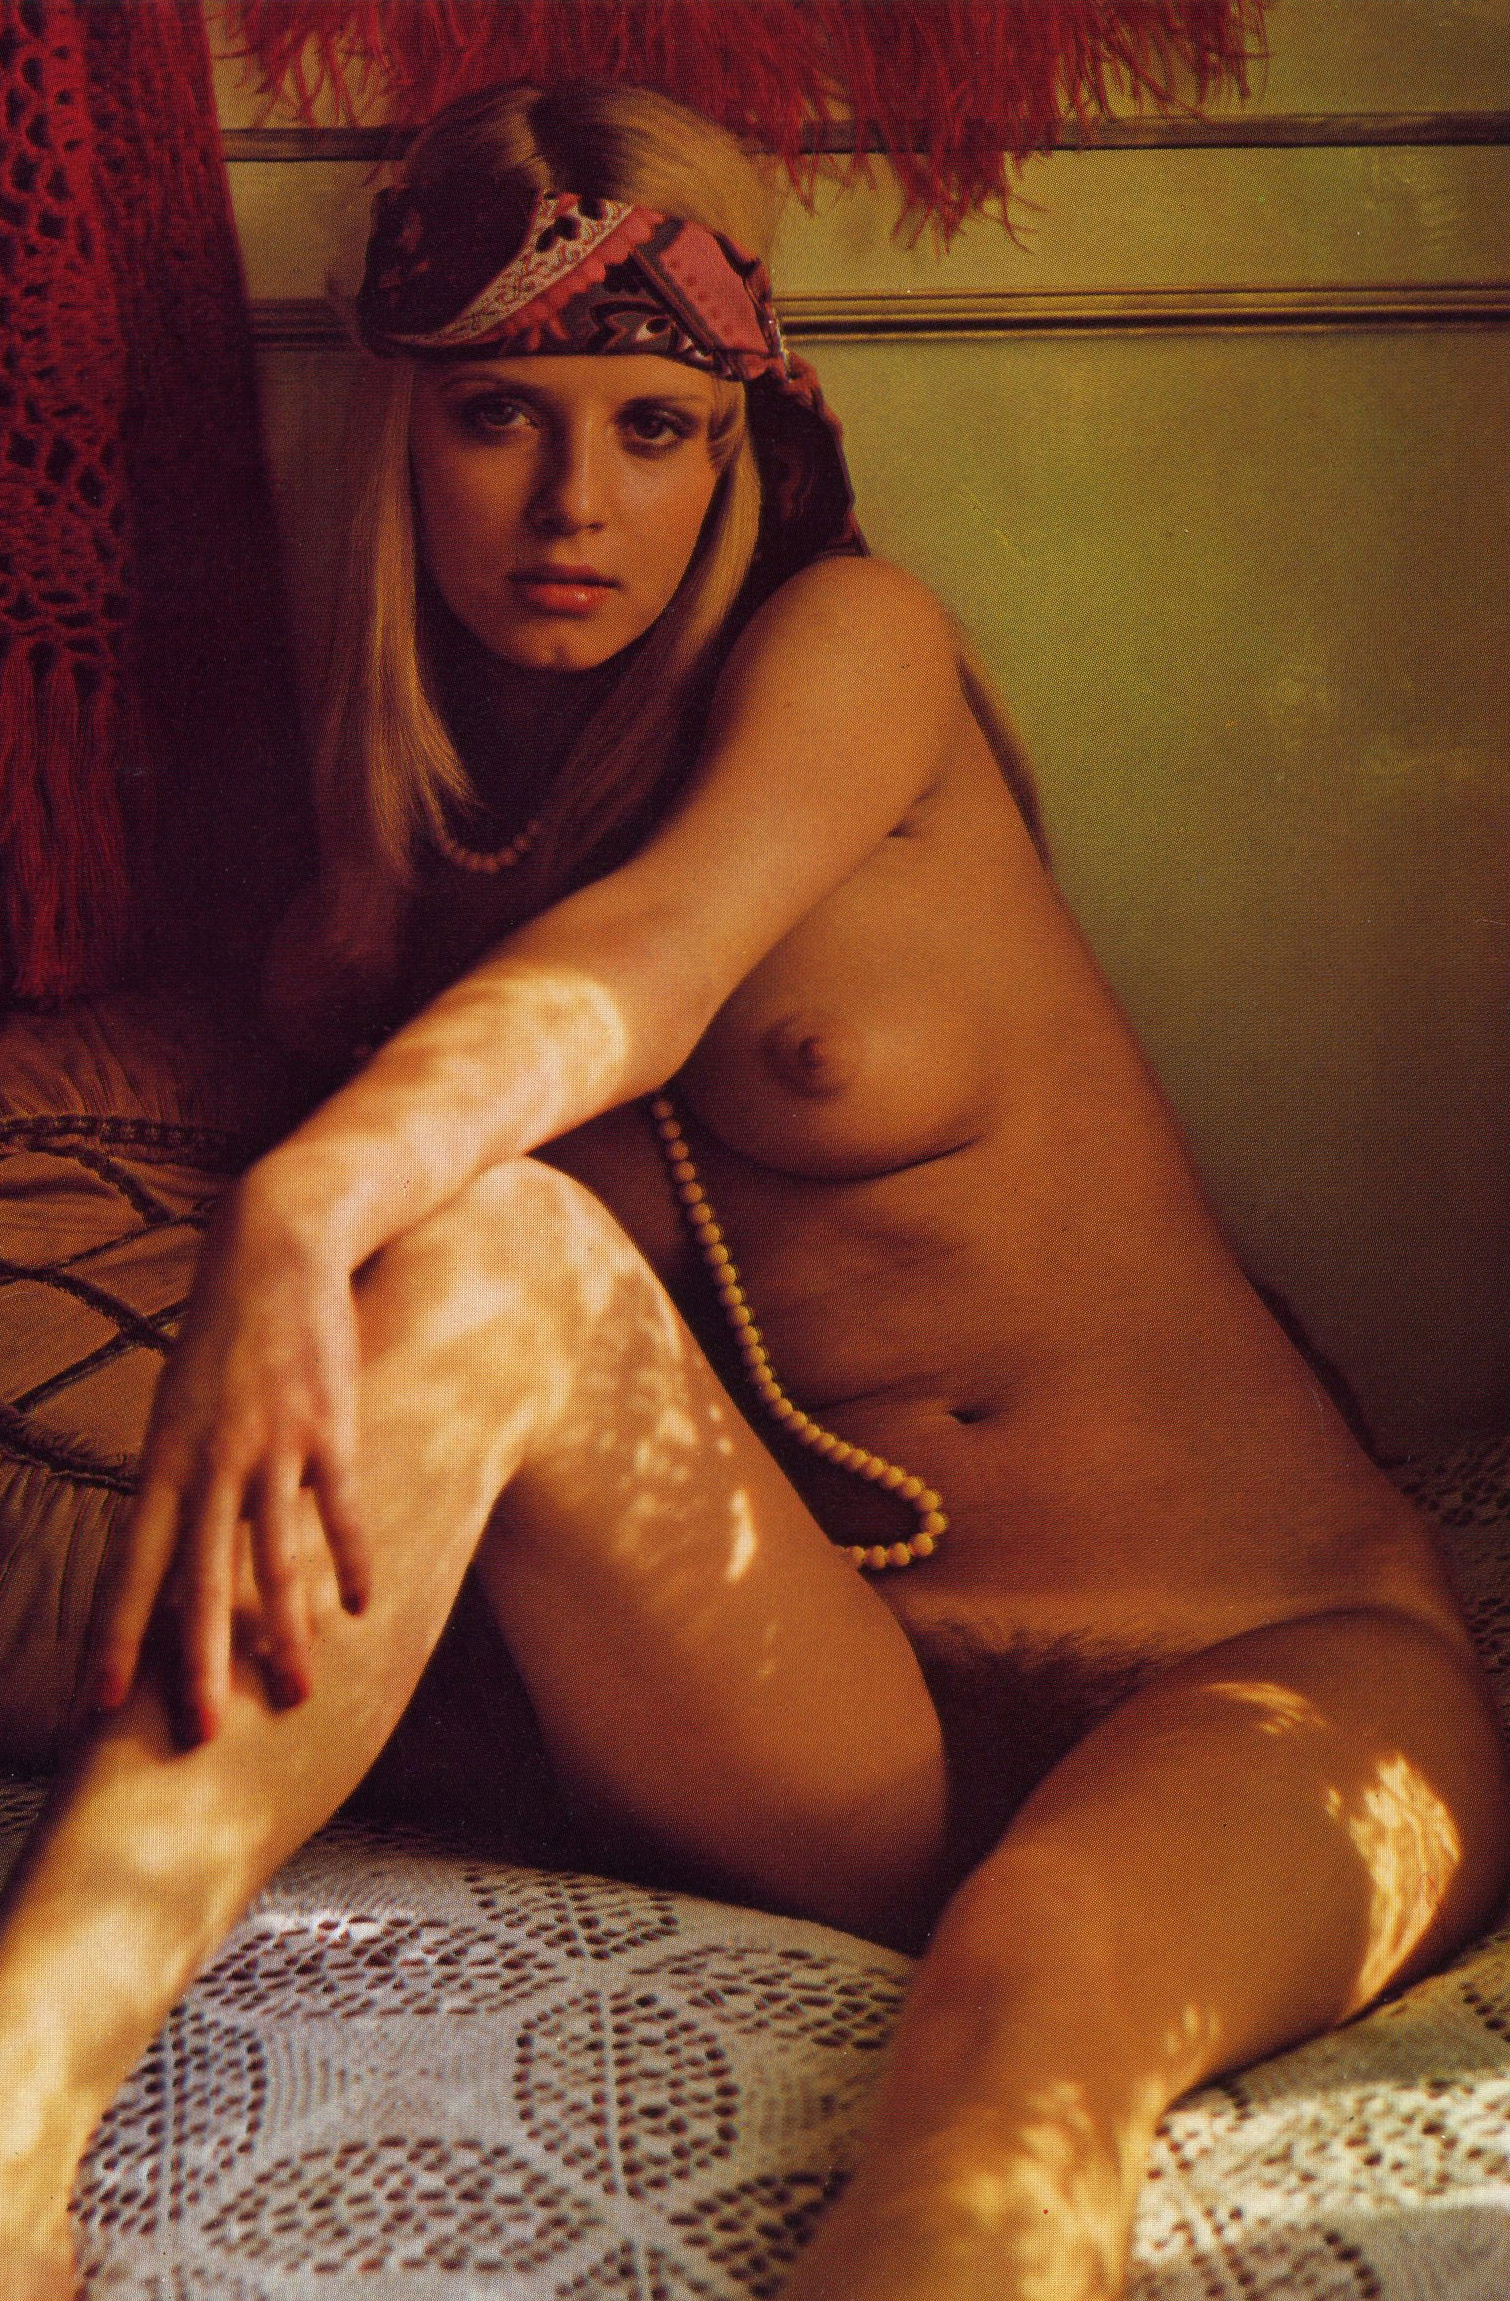 Natasha-Williams-Mayfair-Magazine-Vol.10-No.03-1975.jpg